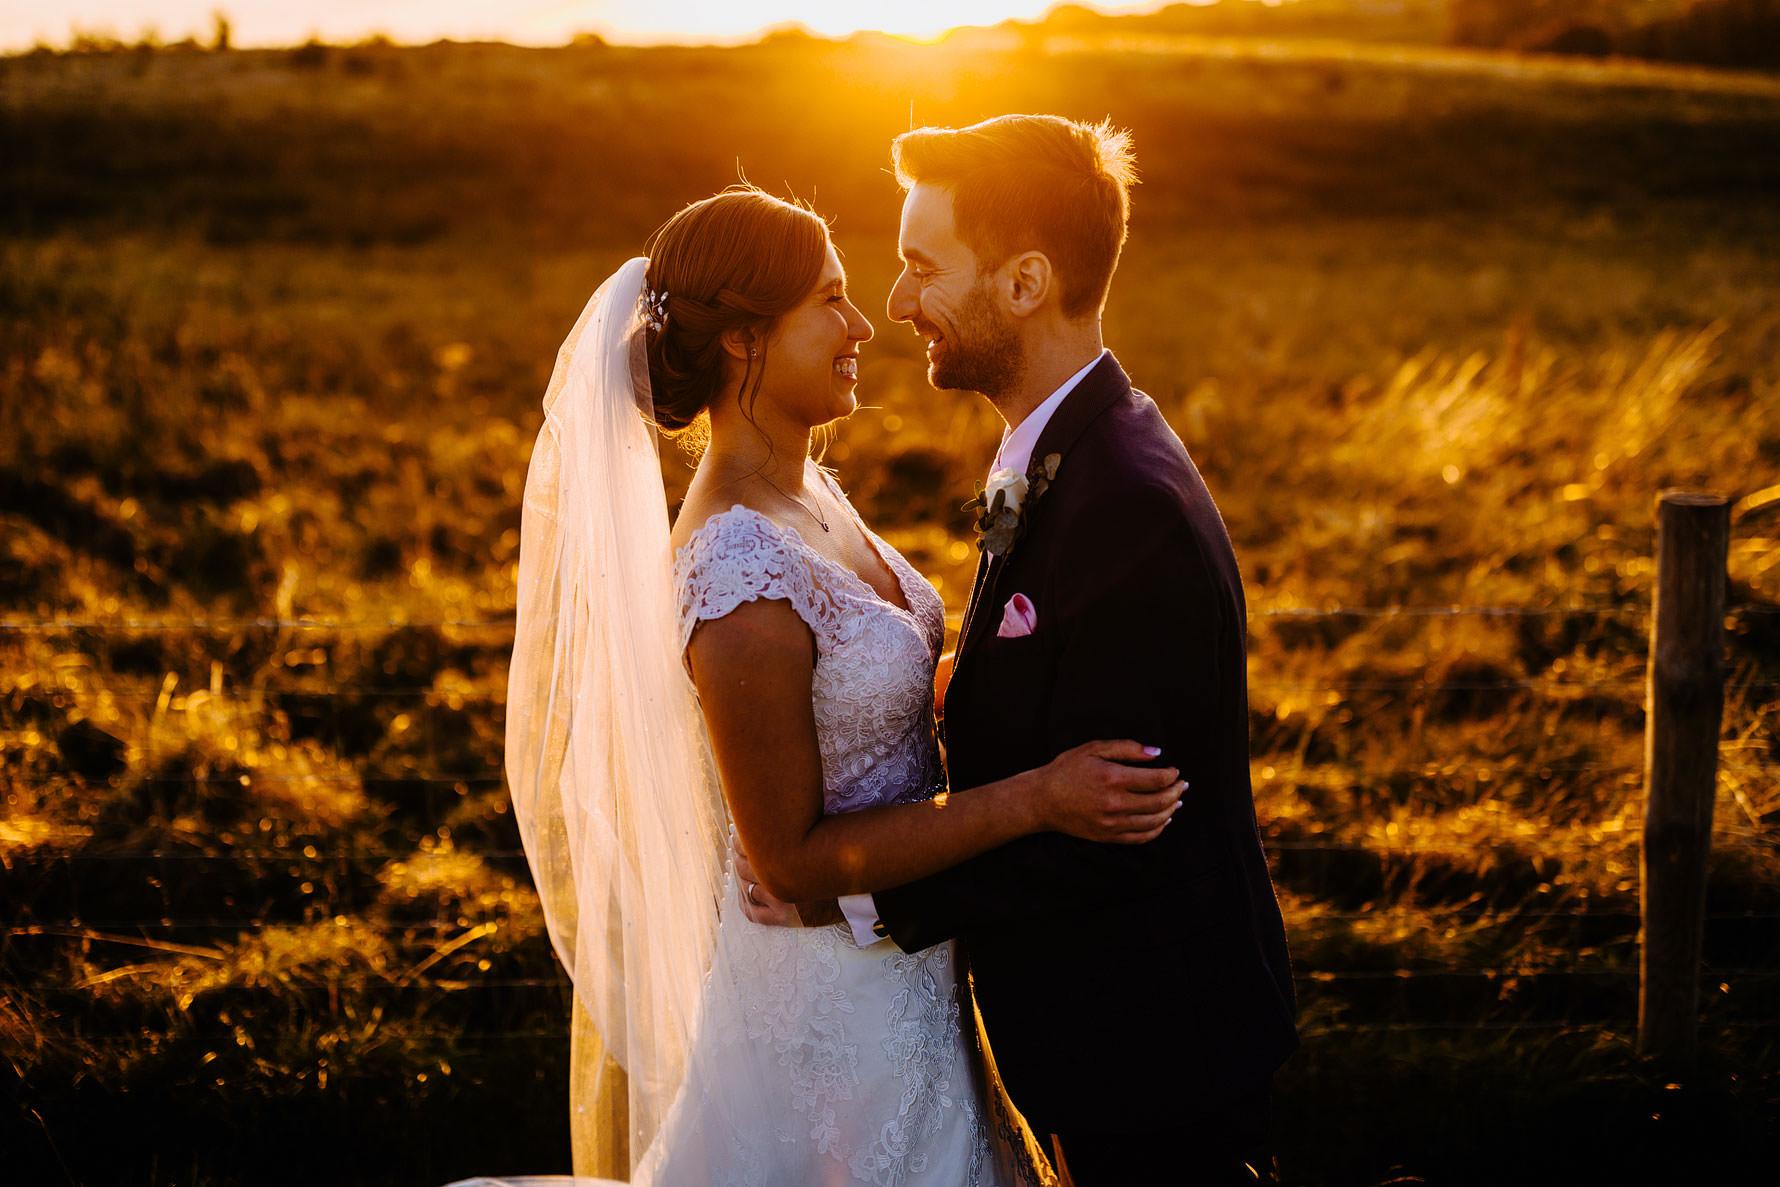 sunset at a wedding